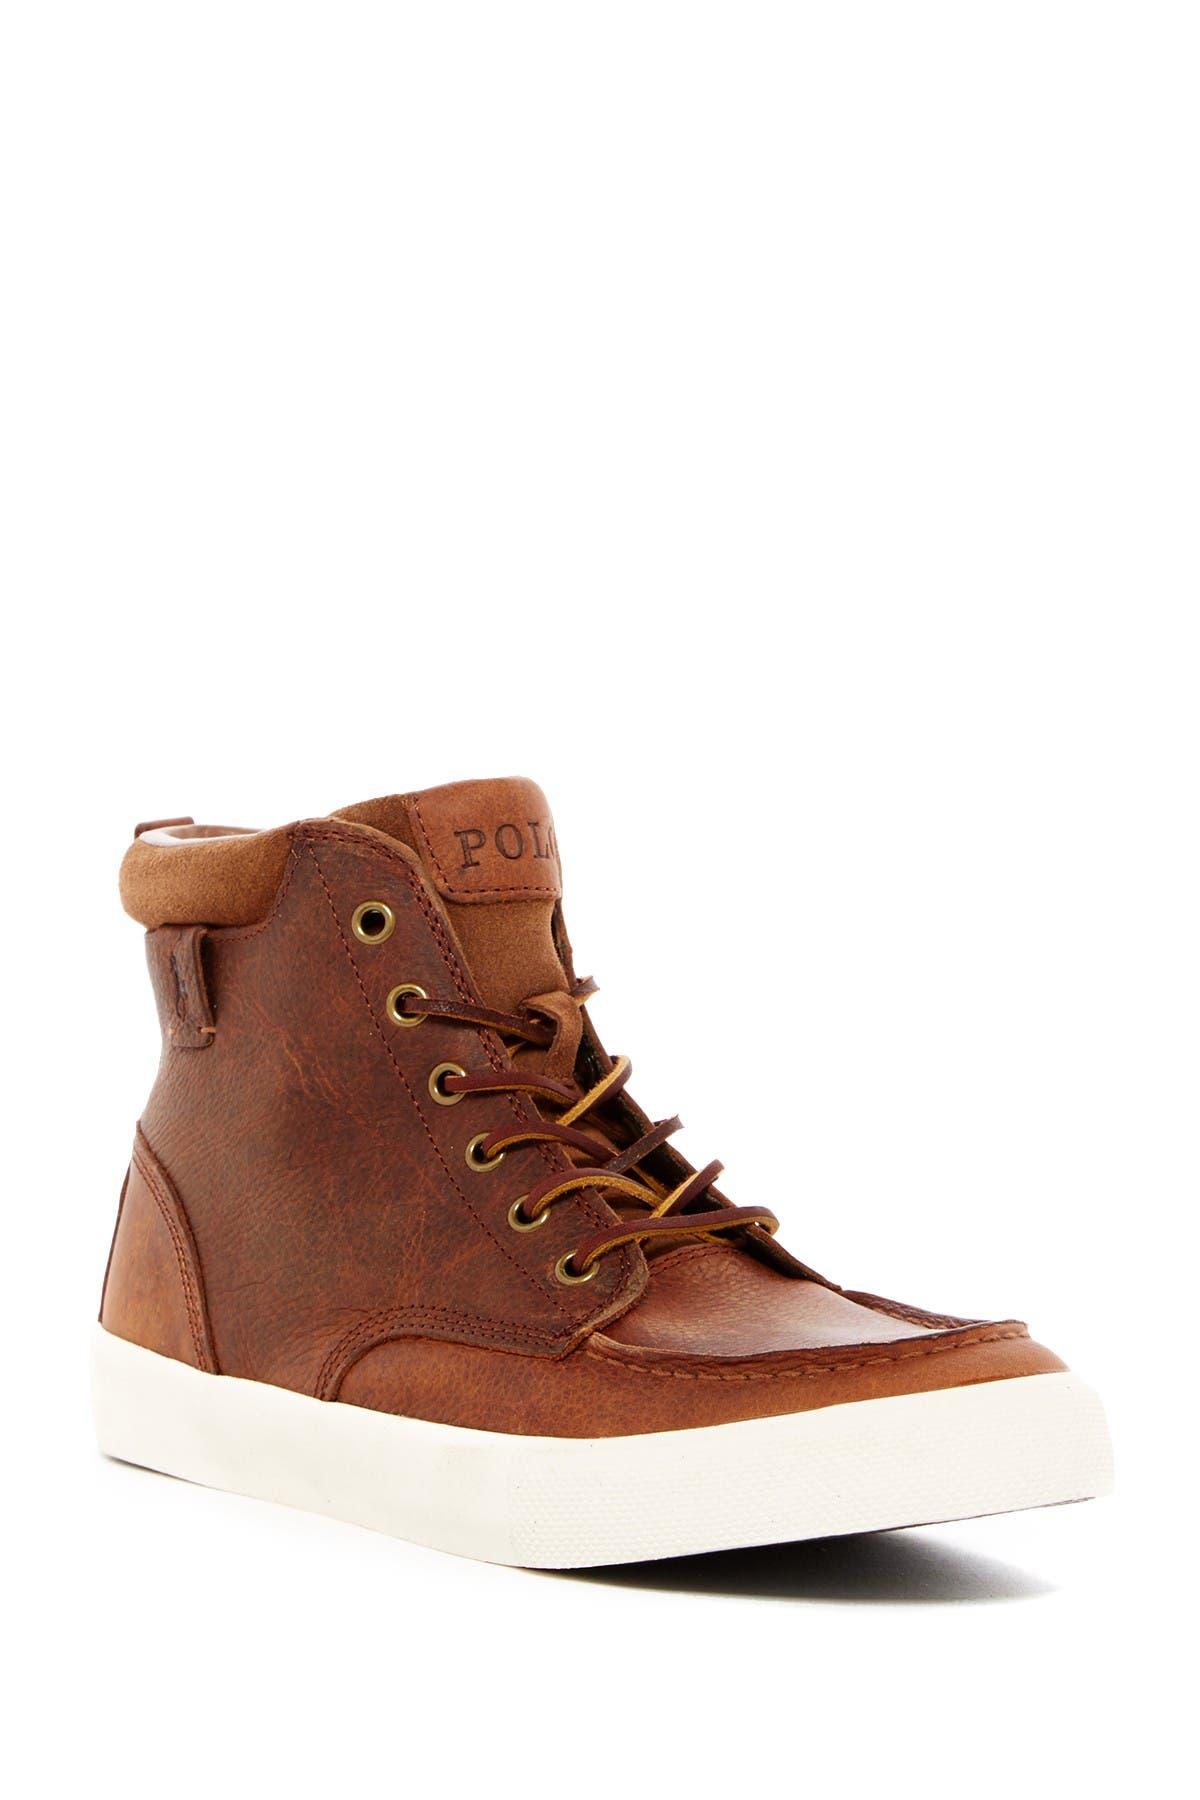 Polo Ralph Lauren   Tedd Sneaker